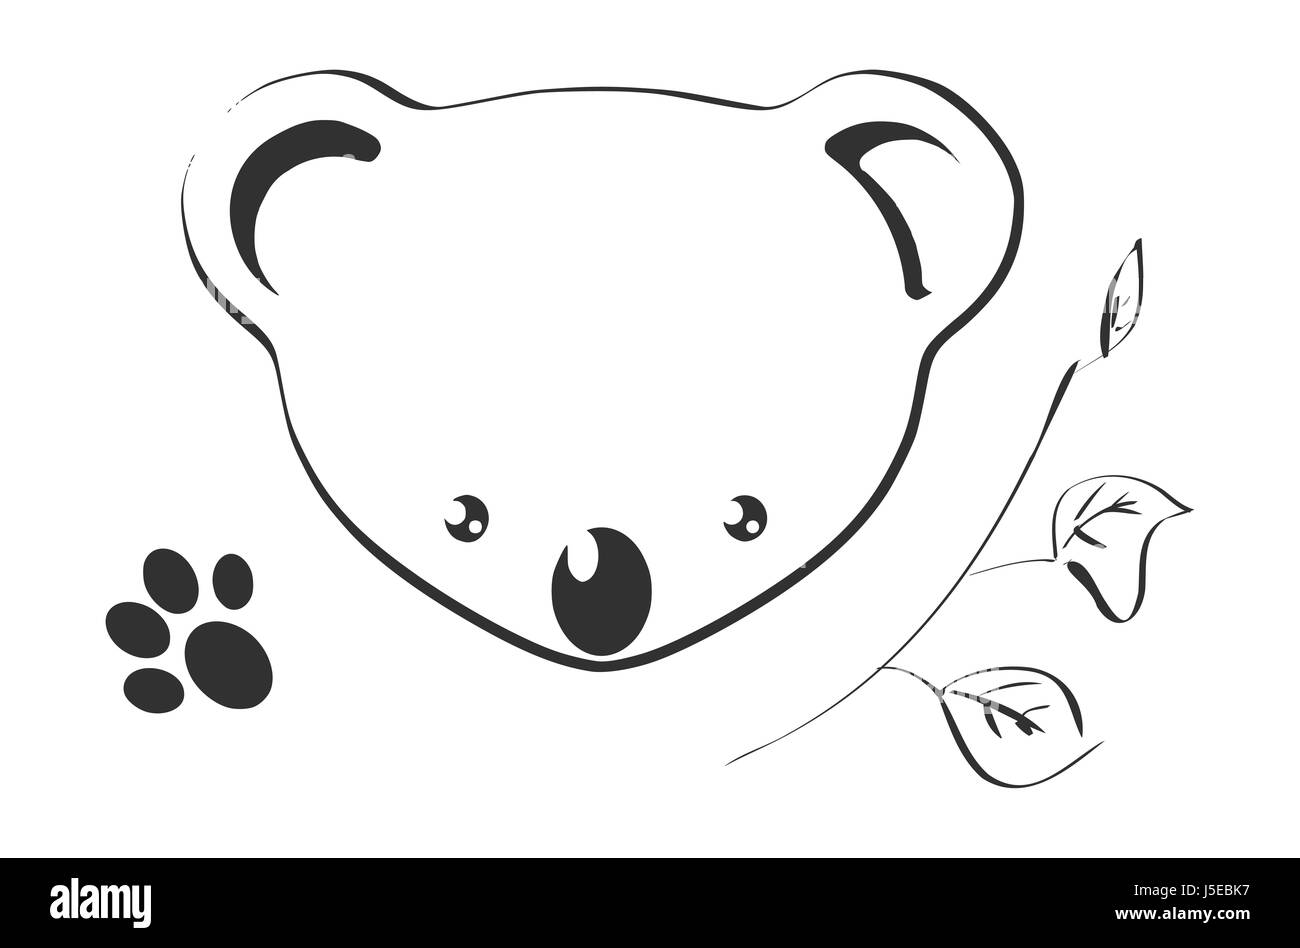 graphic animal bear australia illustration drawing photo picture image copy - Stock Image